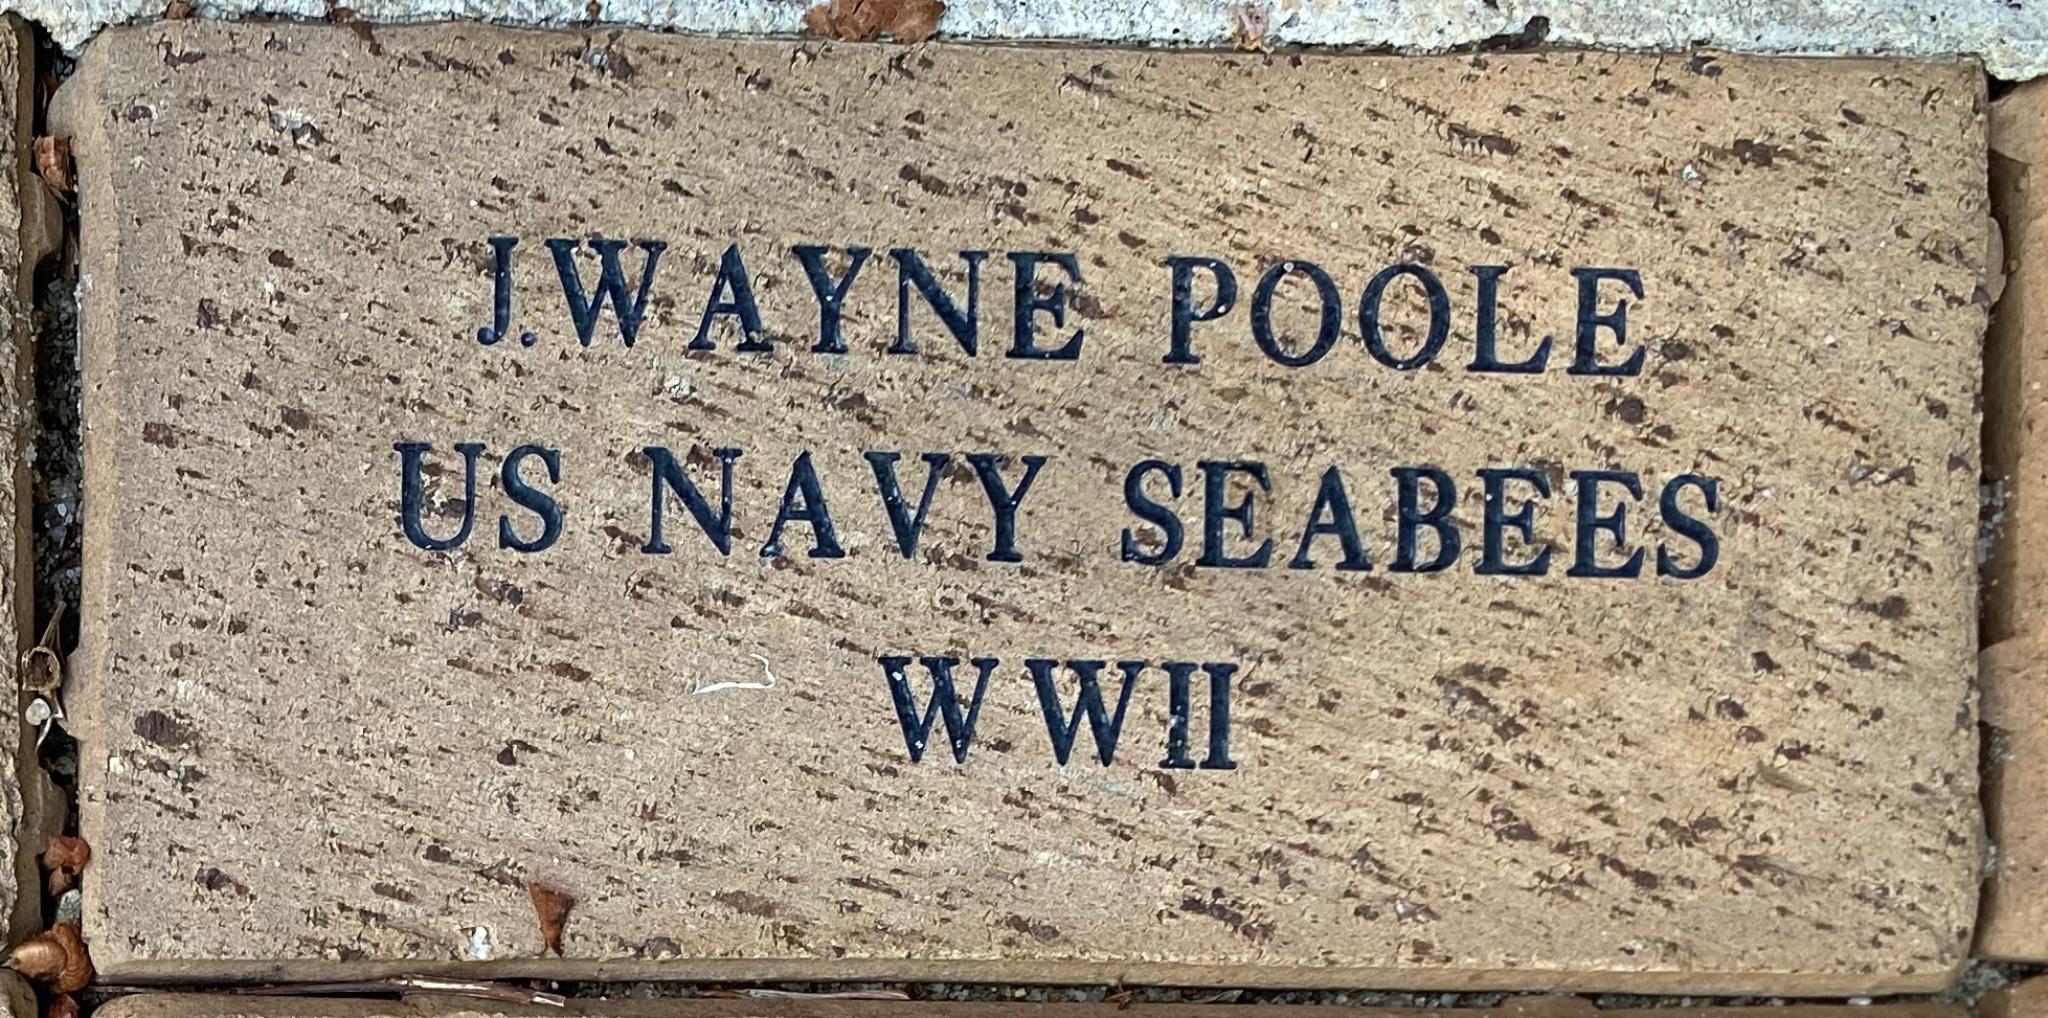 J. WAYNE POOLE US NAVY SEABEES WWII